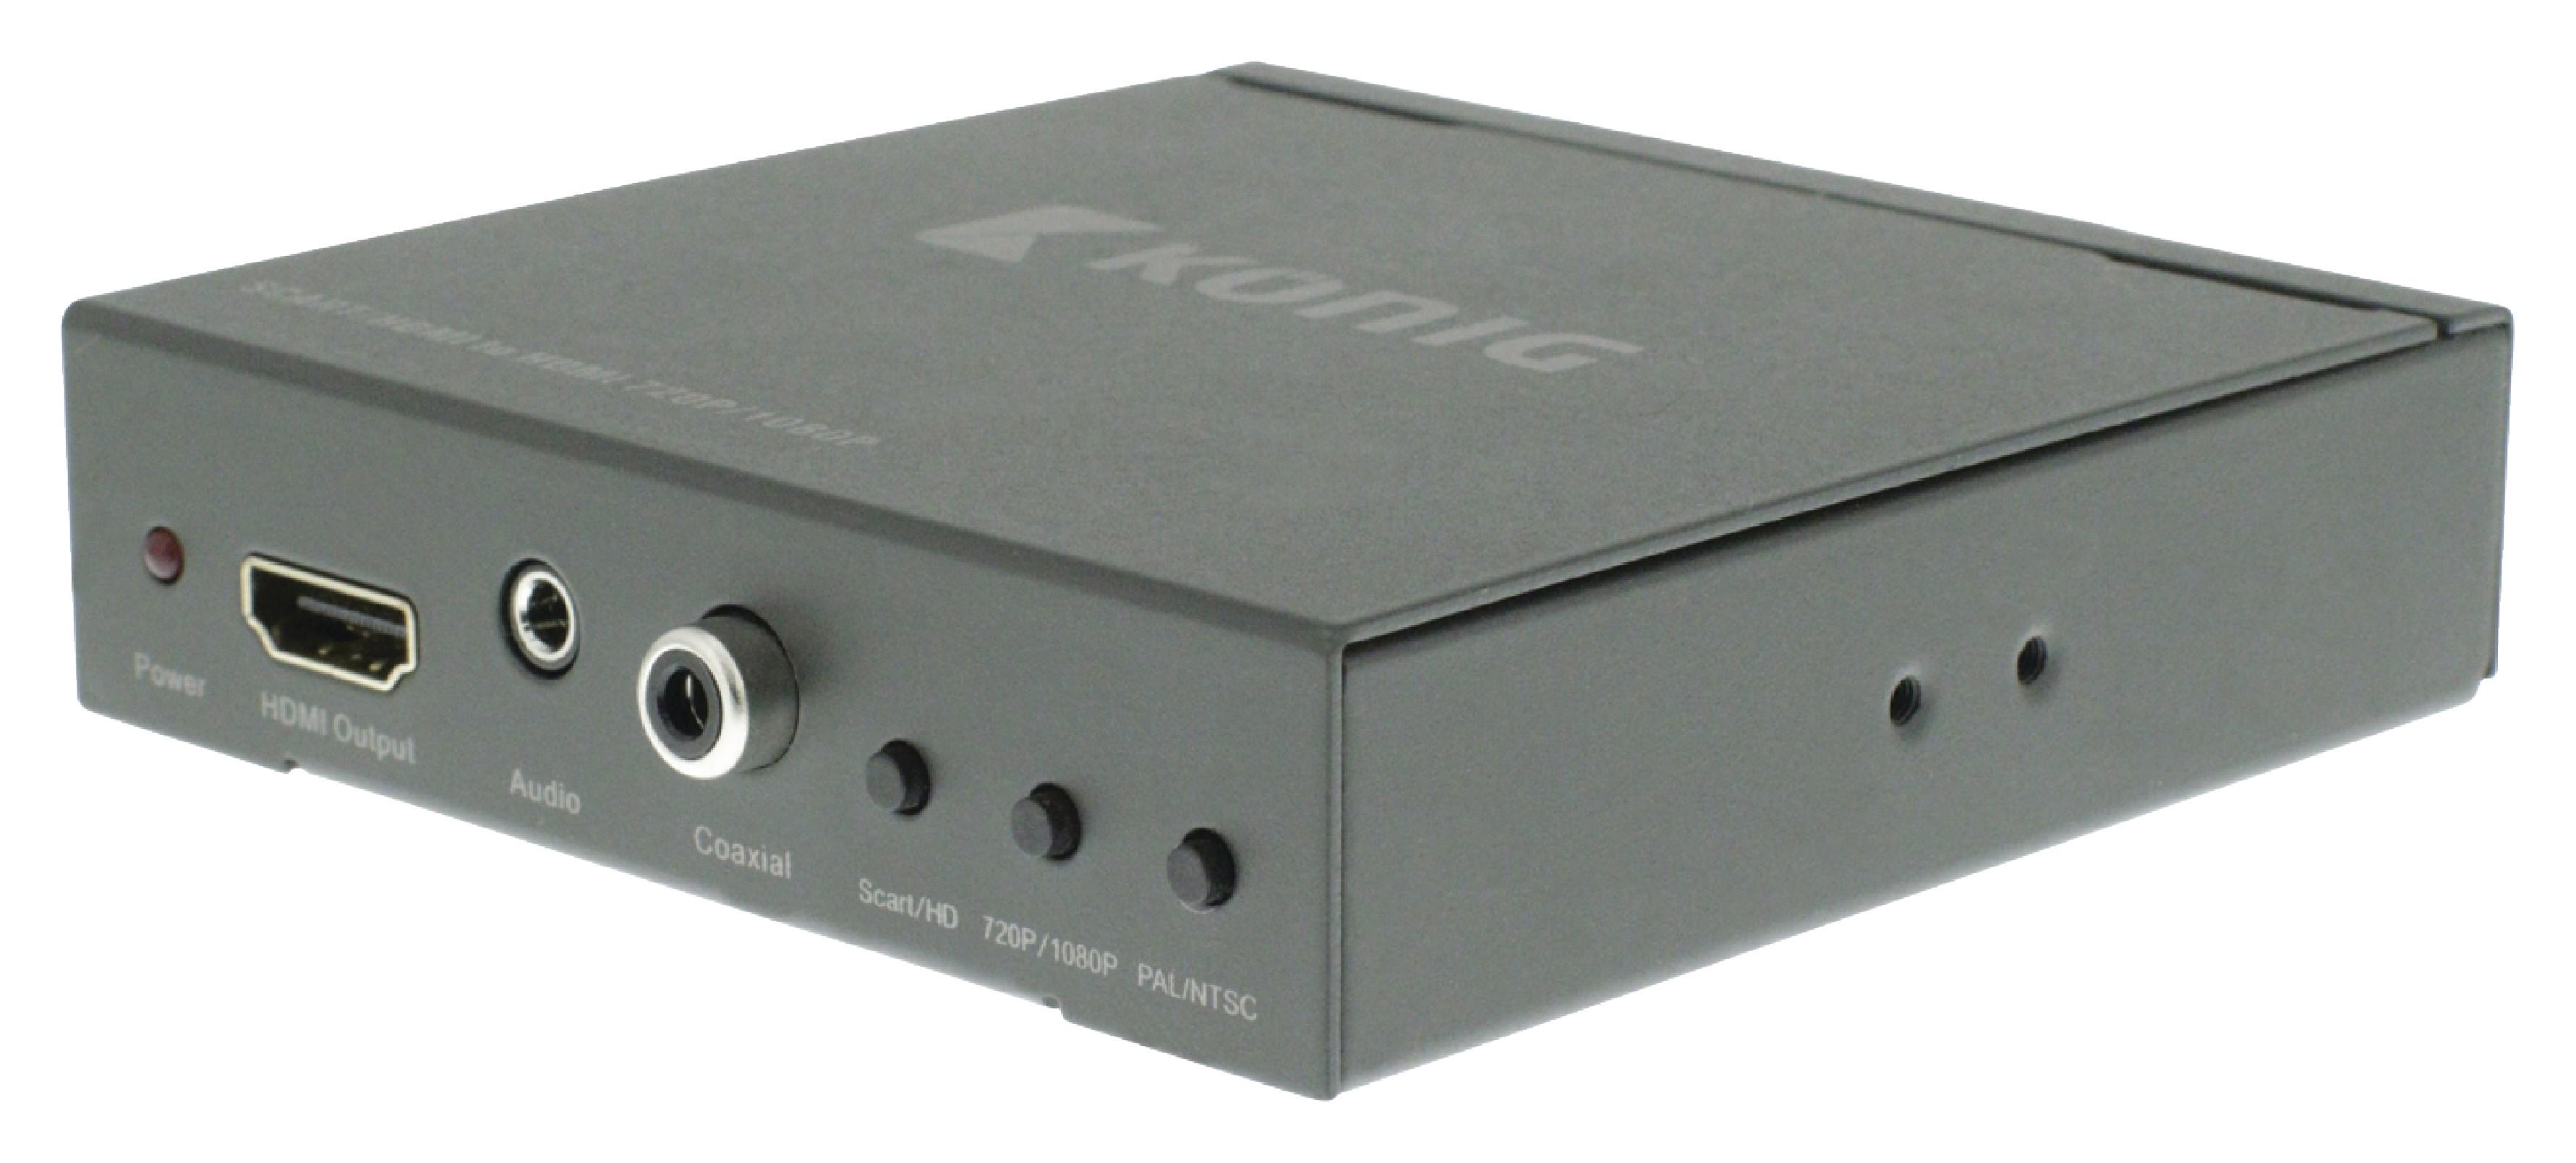 Převodník SCART na HDMI, Full HD 1920x1080 König KNVCO3420